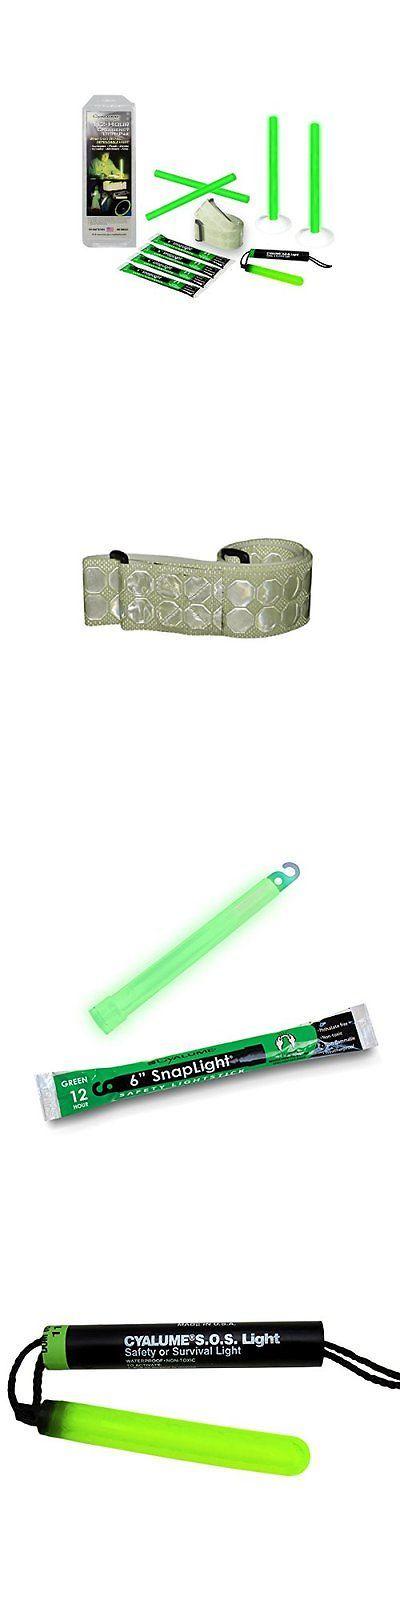 Glow Sticks 159091: Cyalume Industrial Grade Emergency Lightpak Plus Chemical Emergency Light Set... -> BUY IT NOW ONLY: $35.97 on eBay!